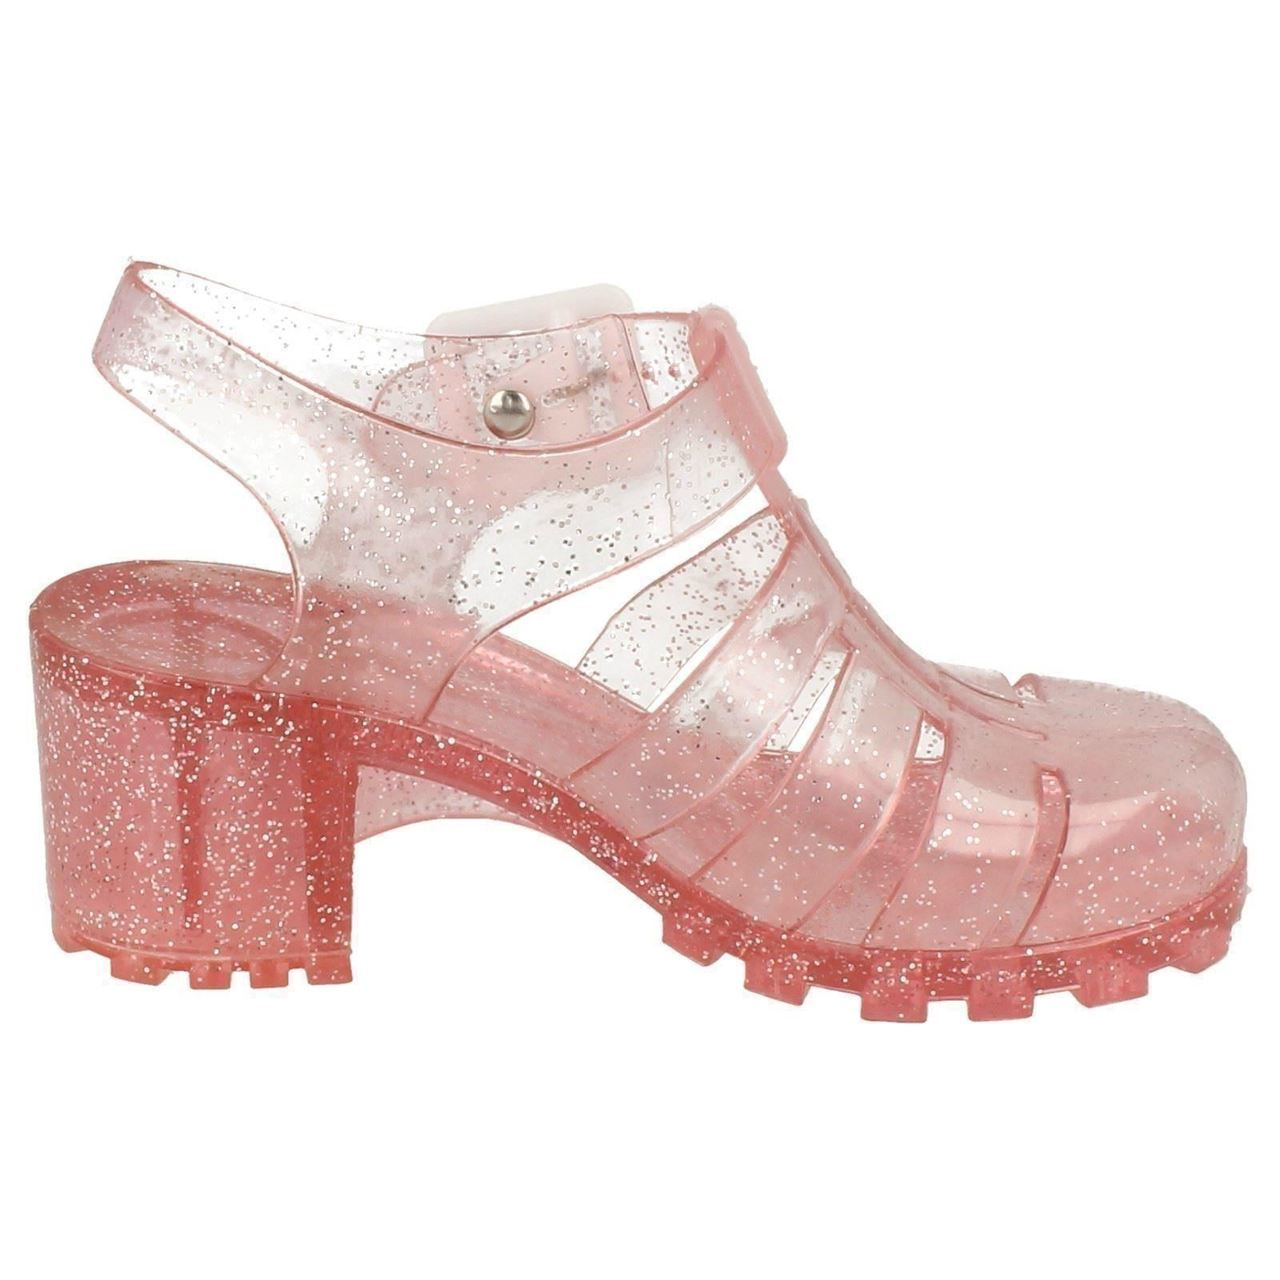 SALE NOW £2.99 Girls Spot On Jelly Sandals in Black Glitter H3040